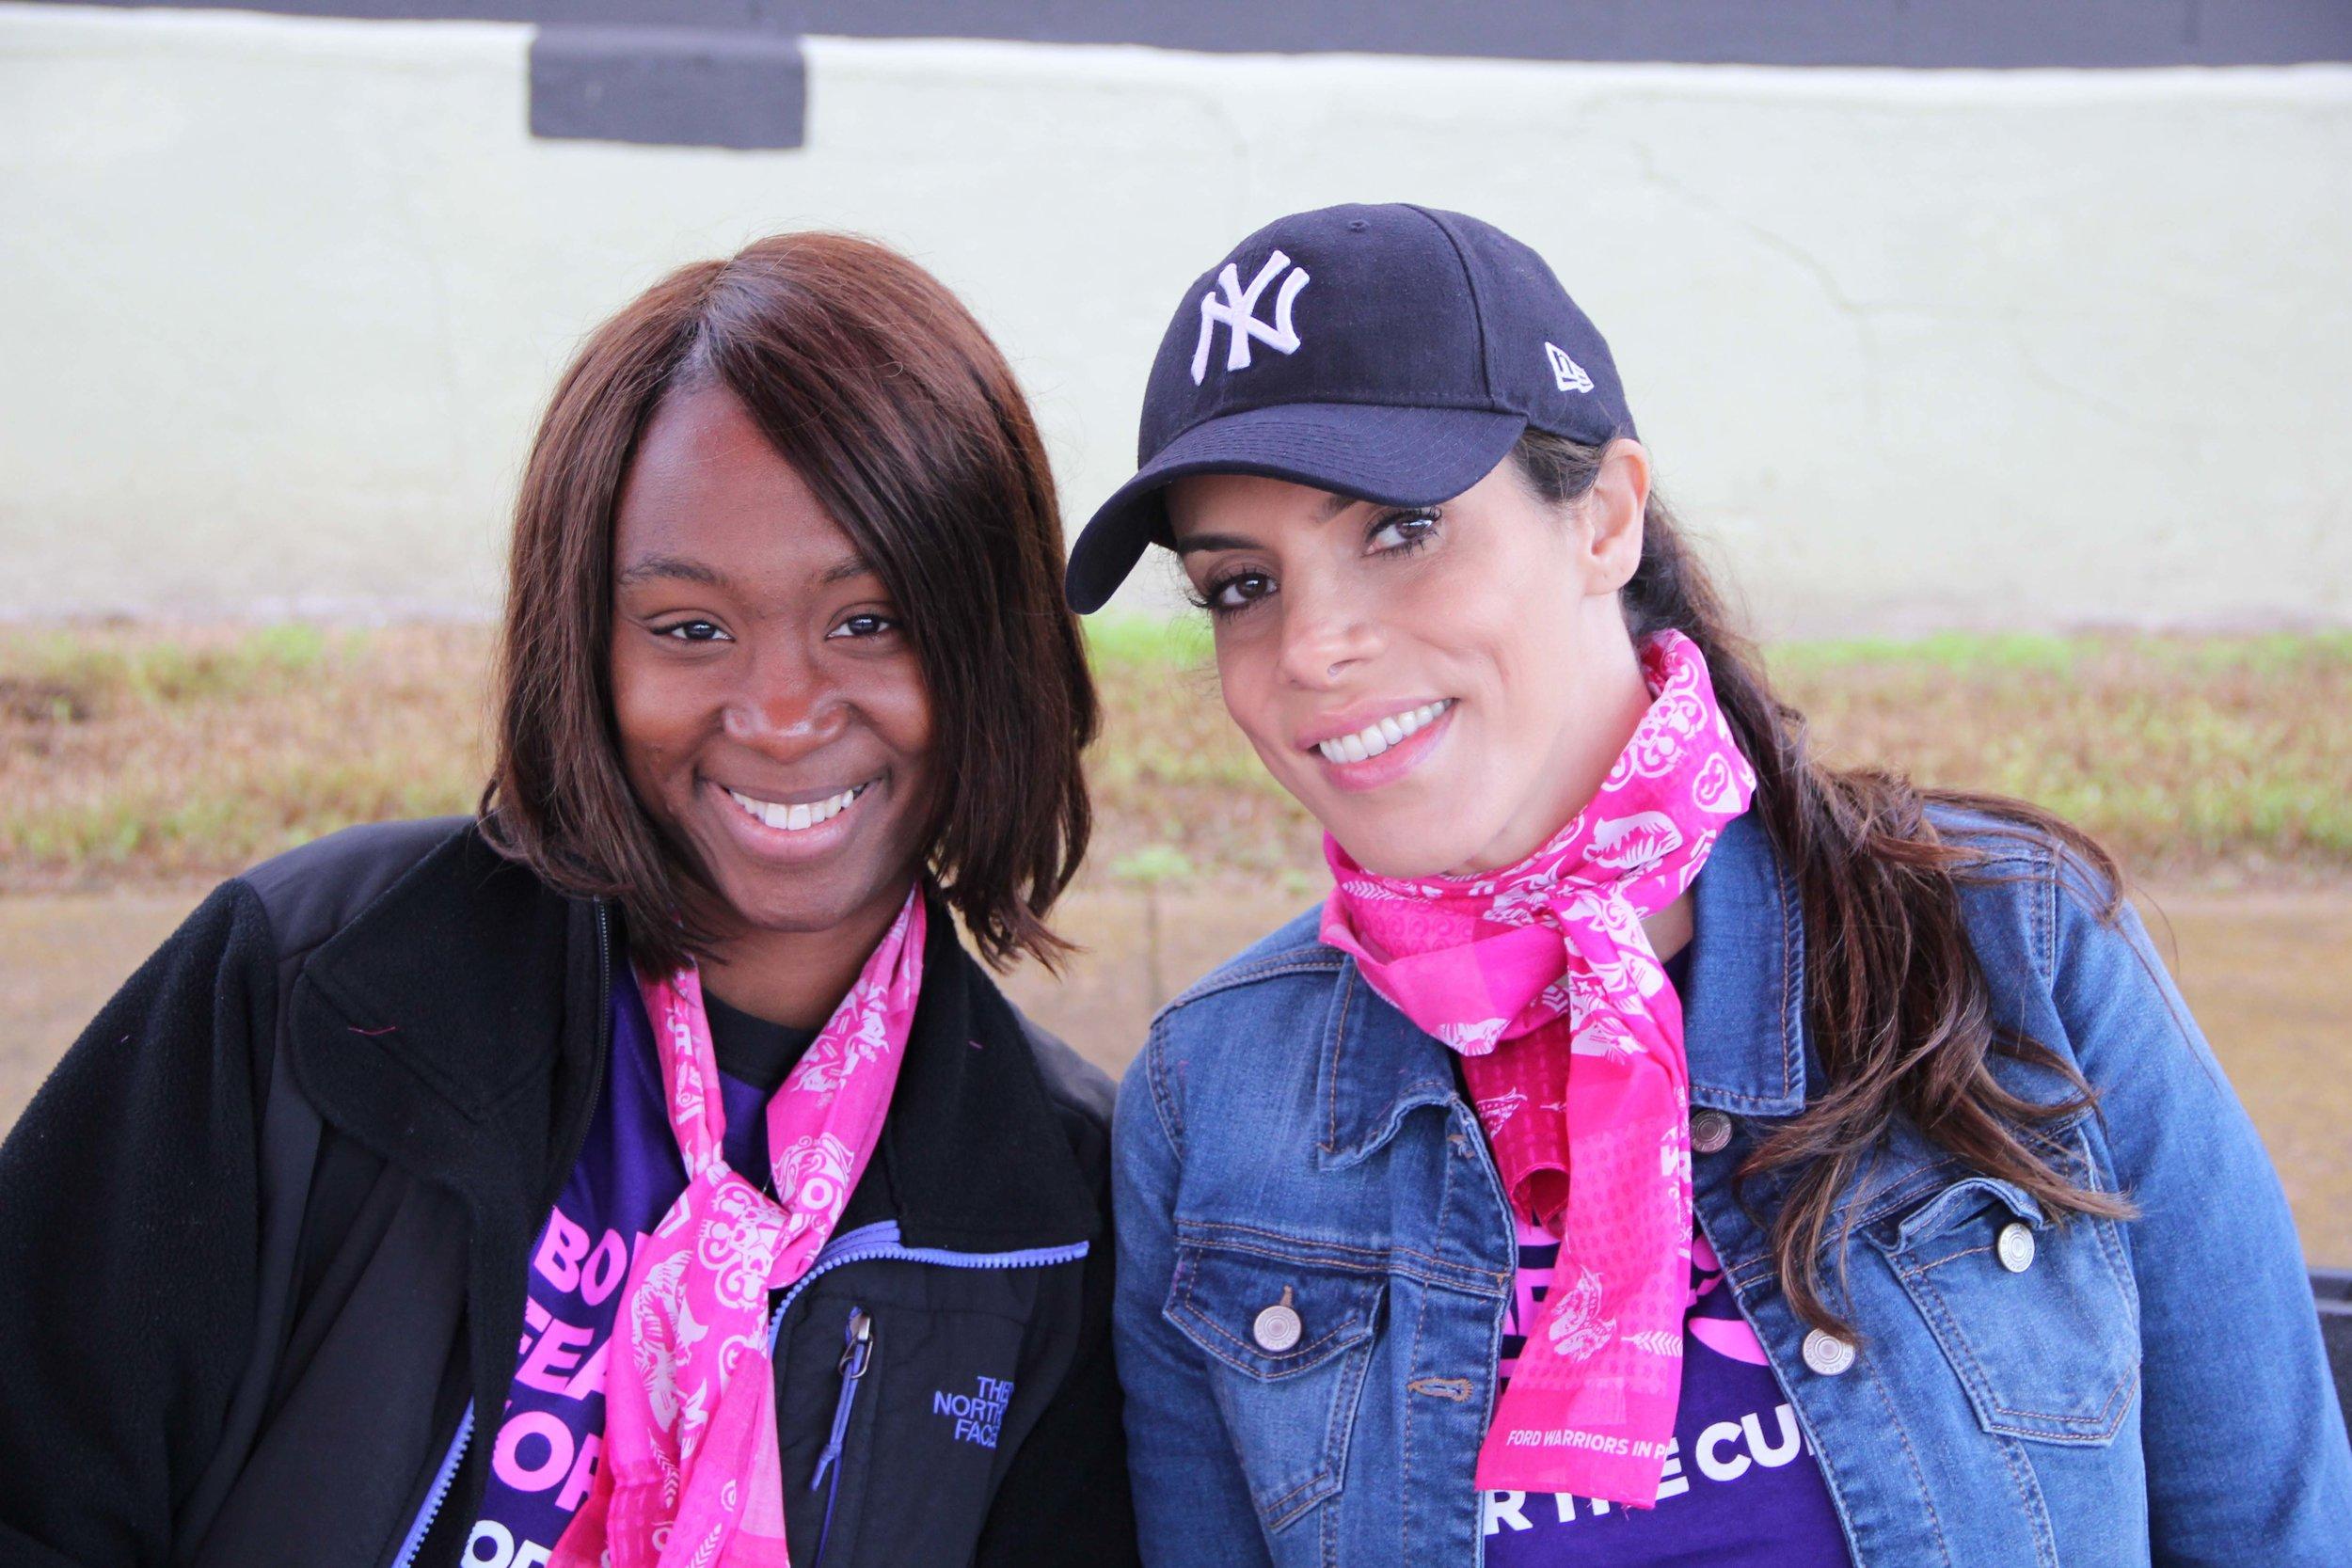 Lamoya Burks and Layla Hazin